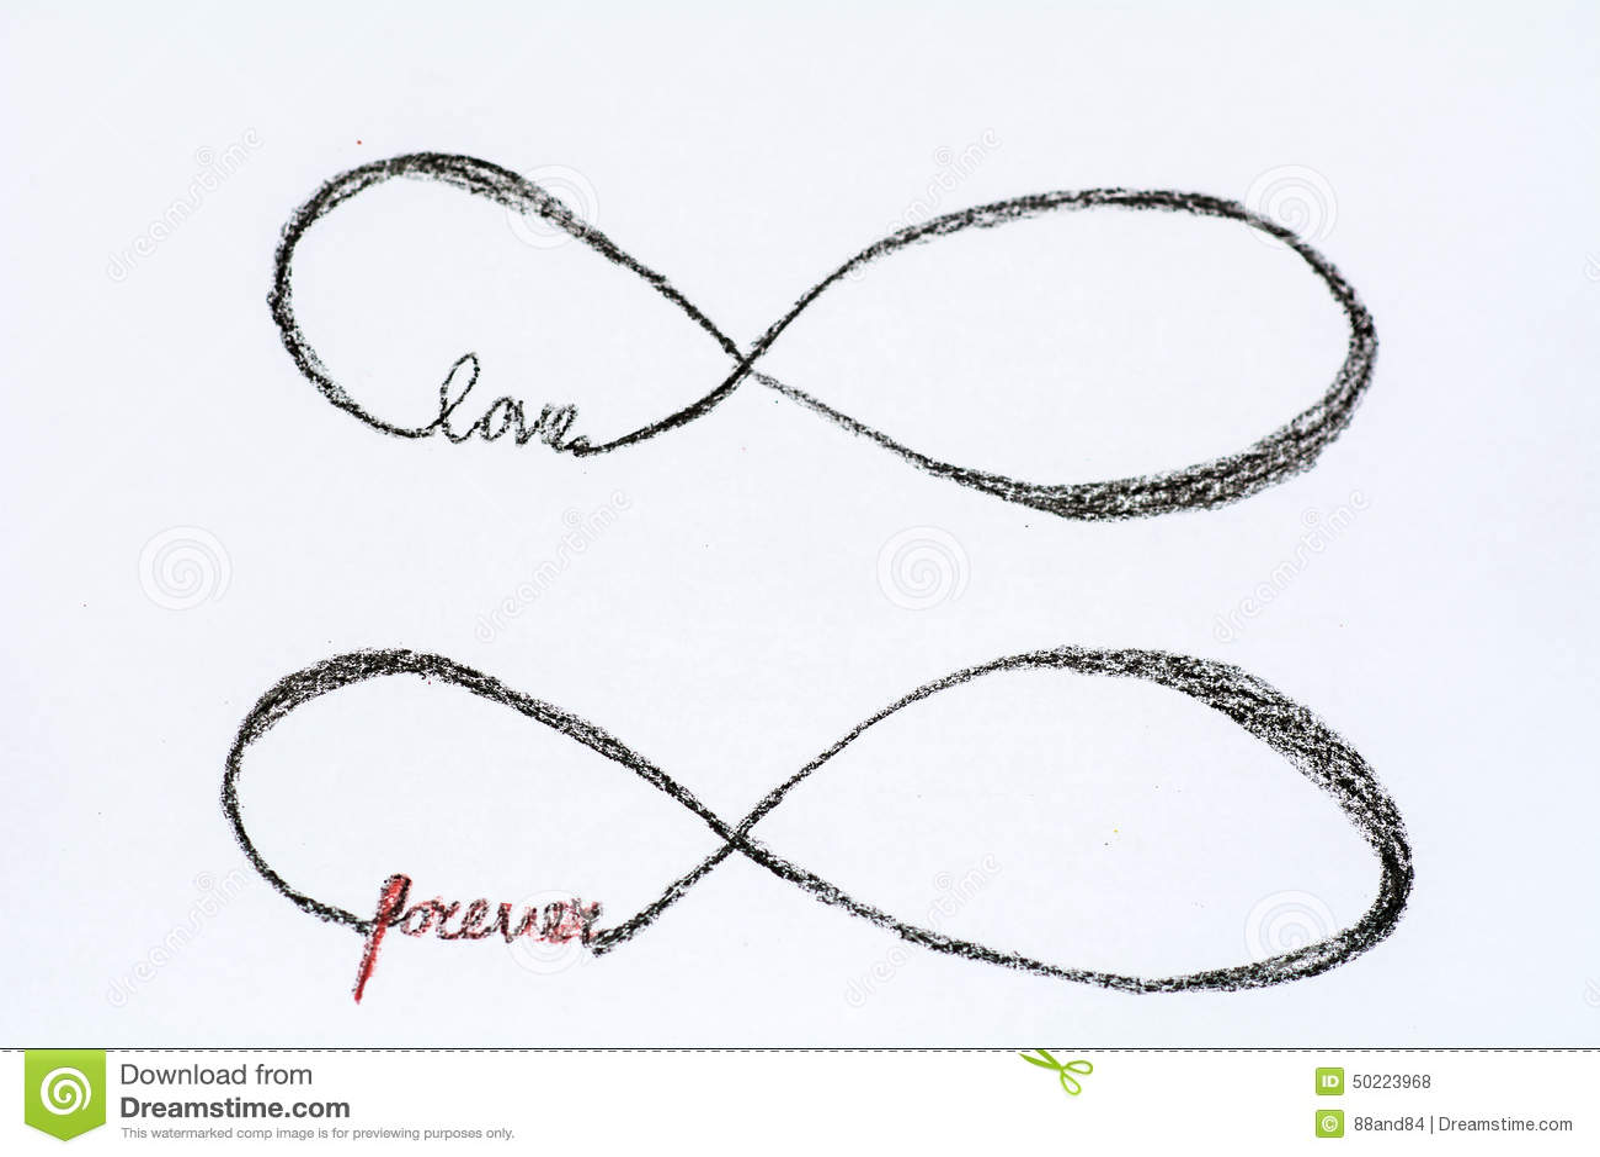 Infinity Heart Ring Tattoo